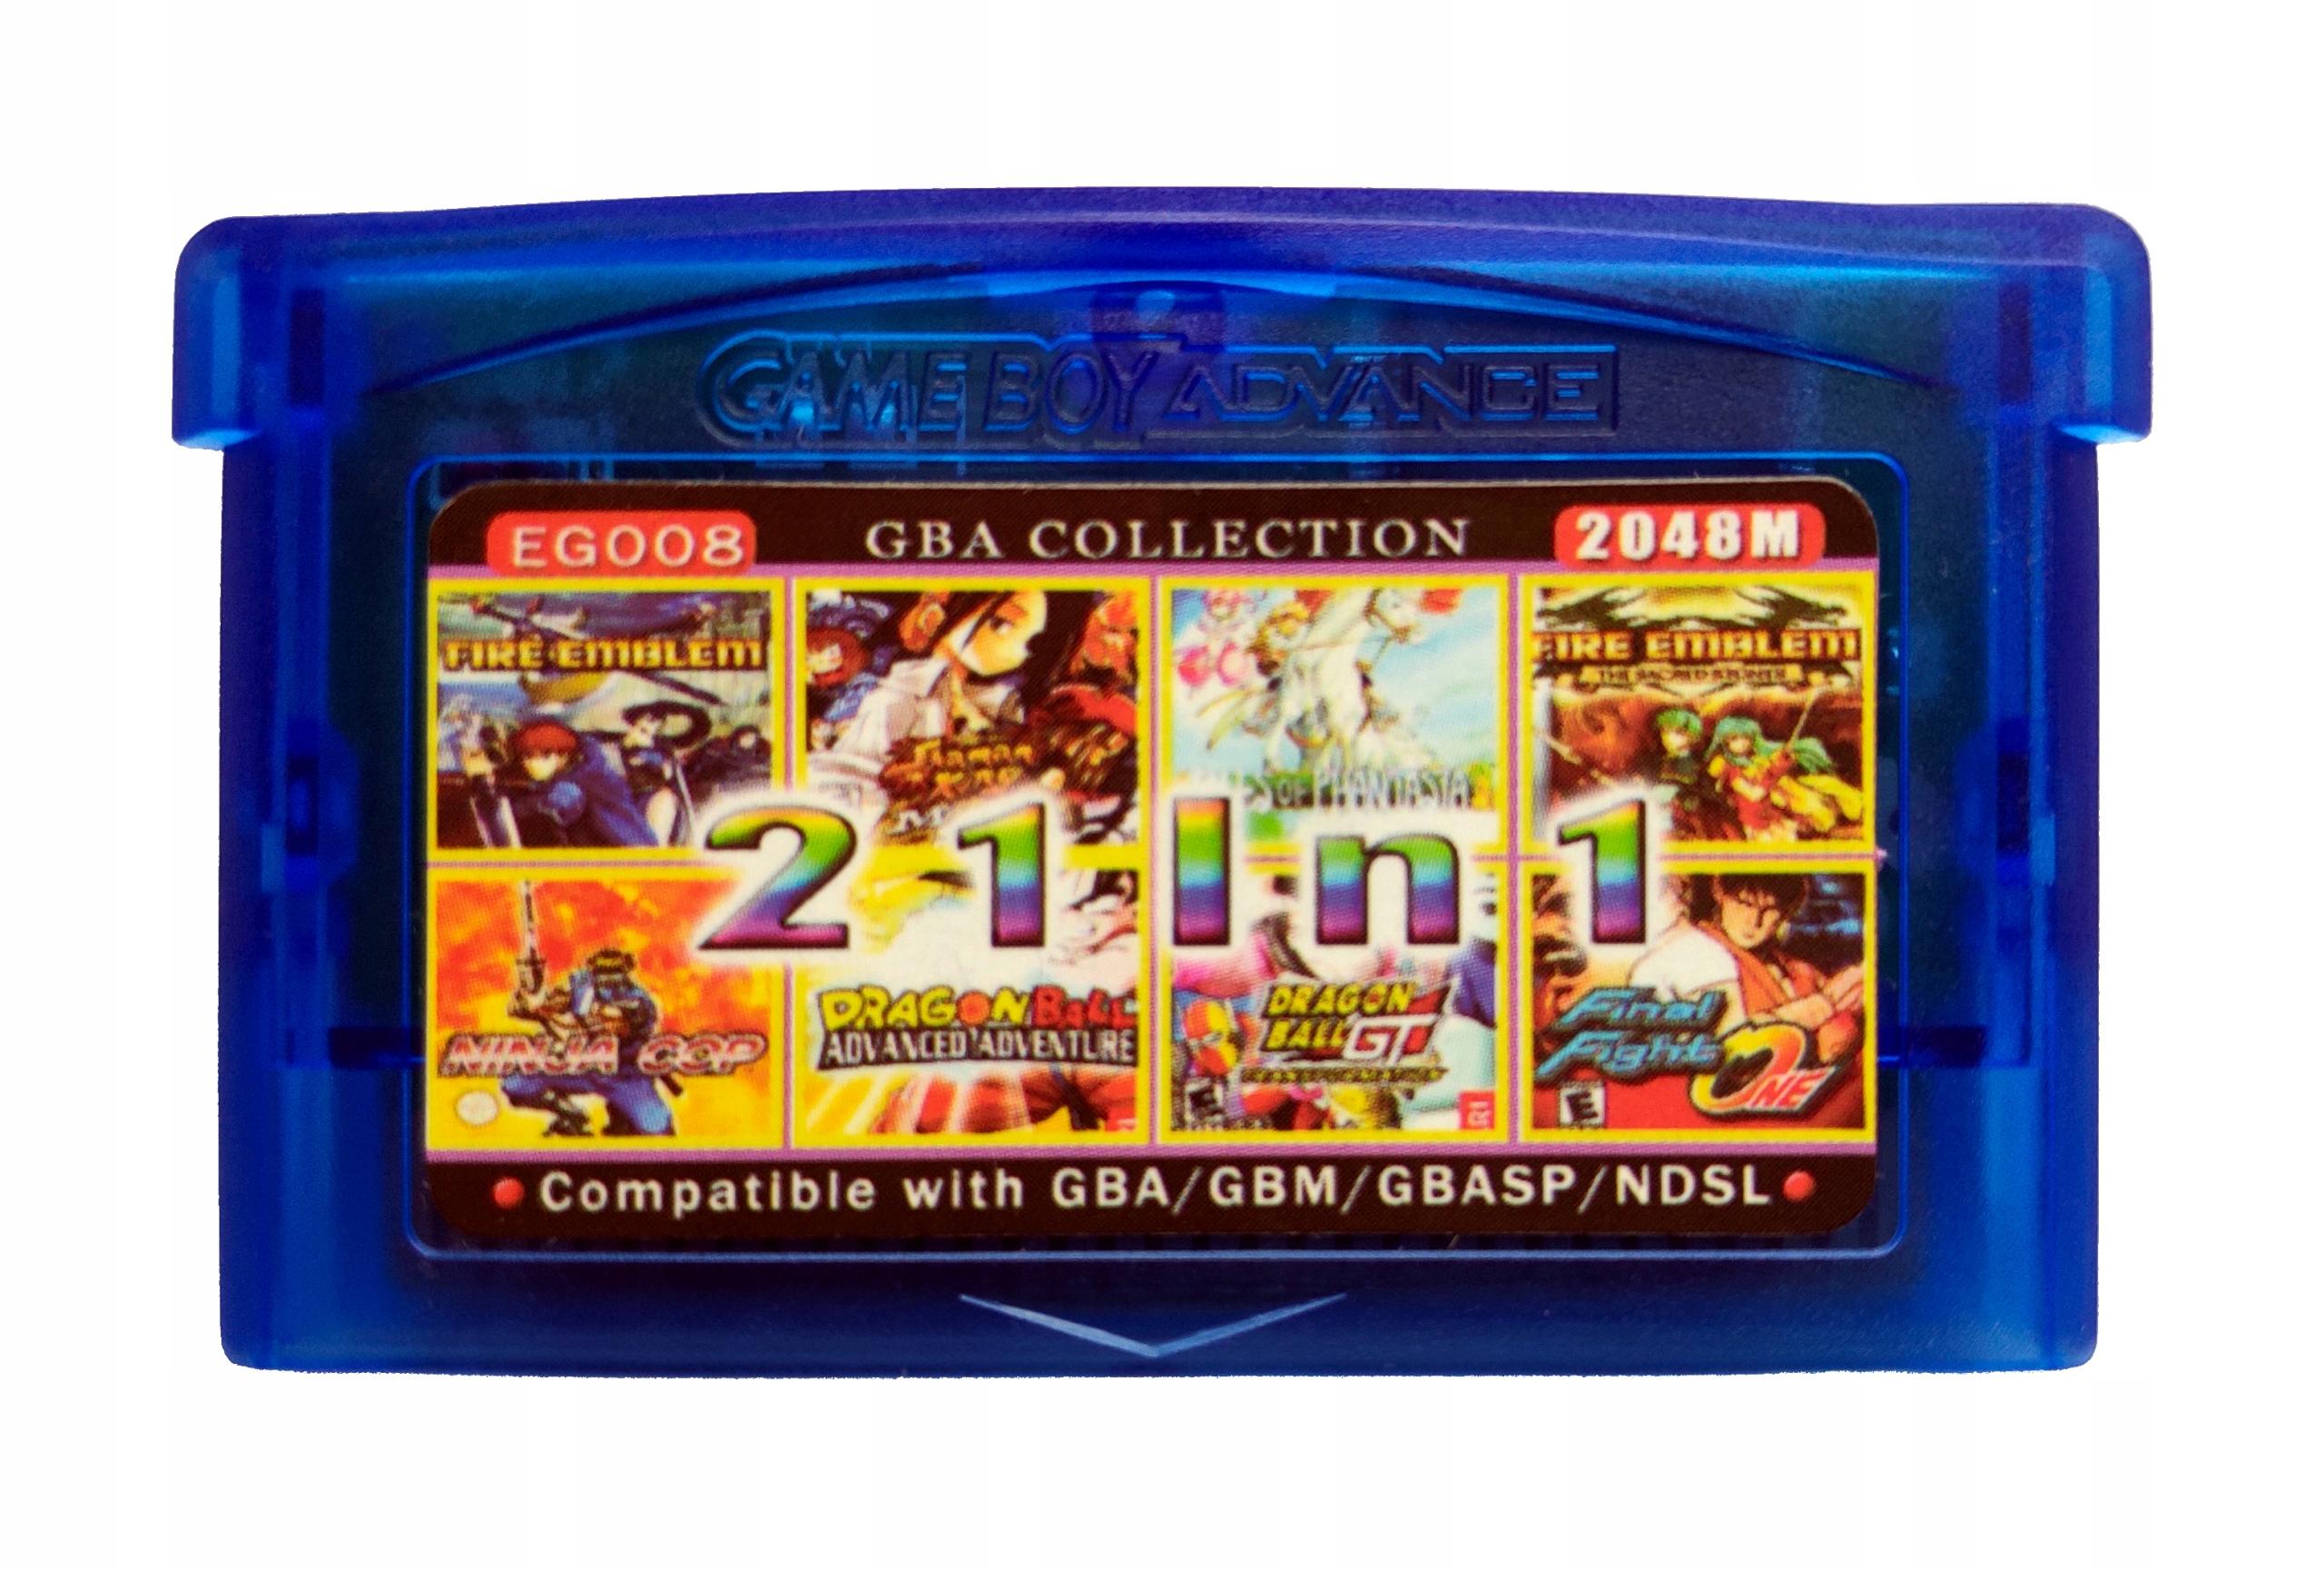 21 v 1 GameBoy Advance - Fire Emblem, Dragon Ball